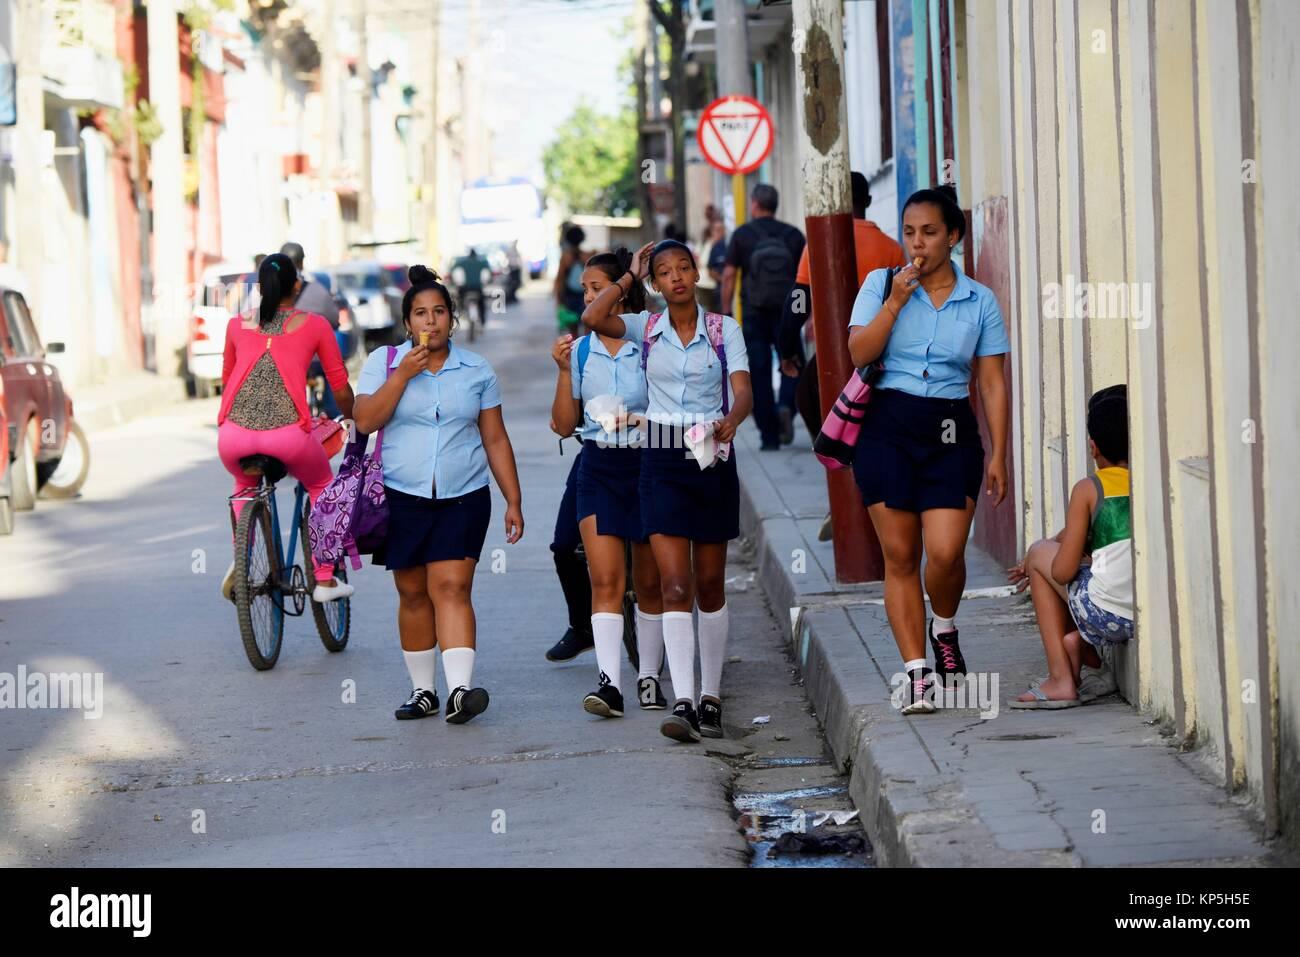 Lycéenne en uniforme,Santa Clara, Cuba. Photo Stock